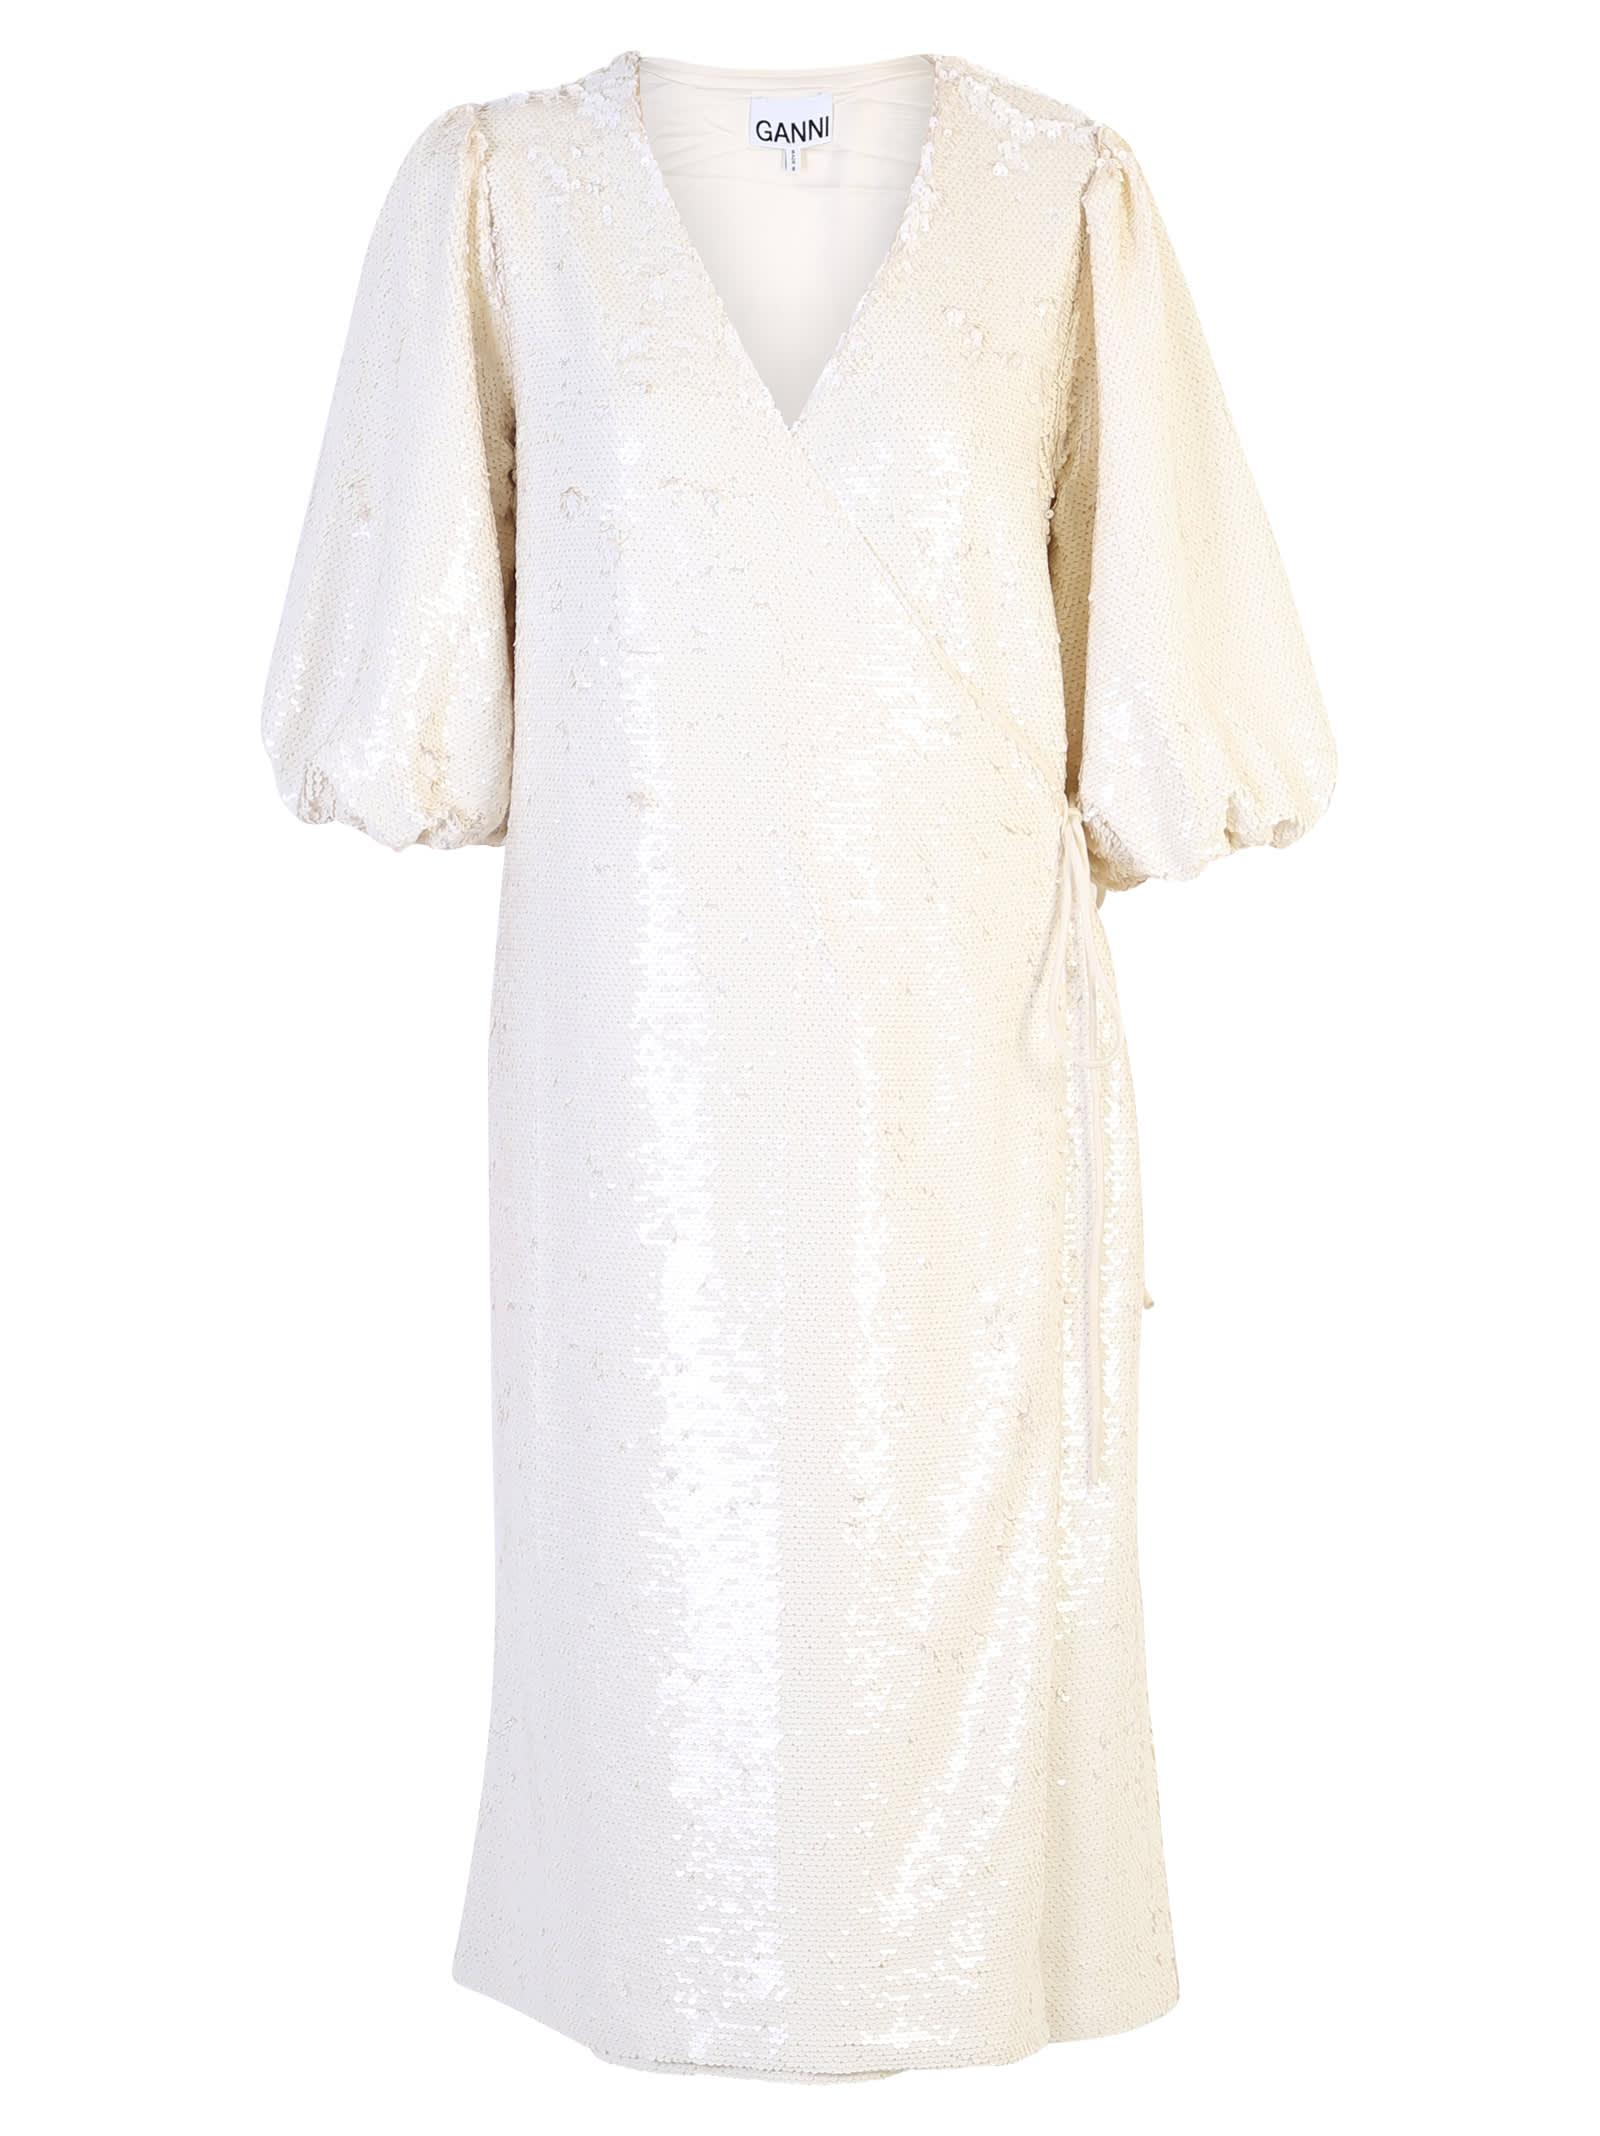 Ganni Sequinned Dress